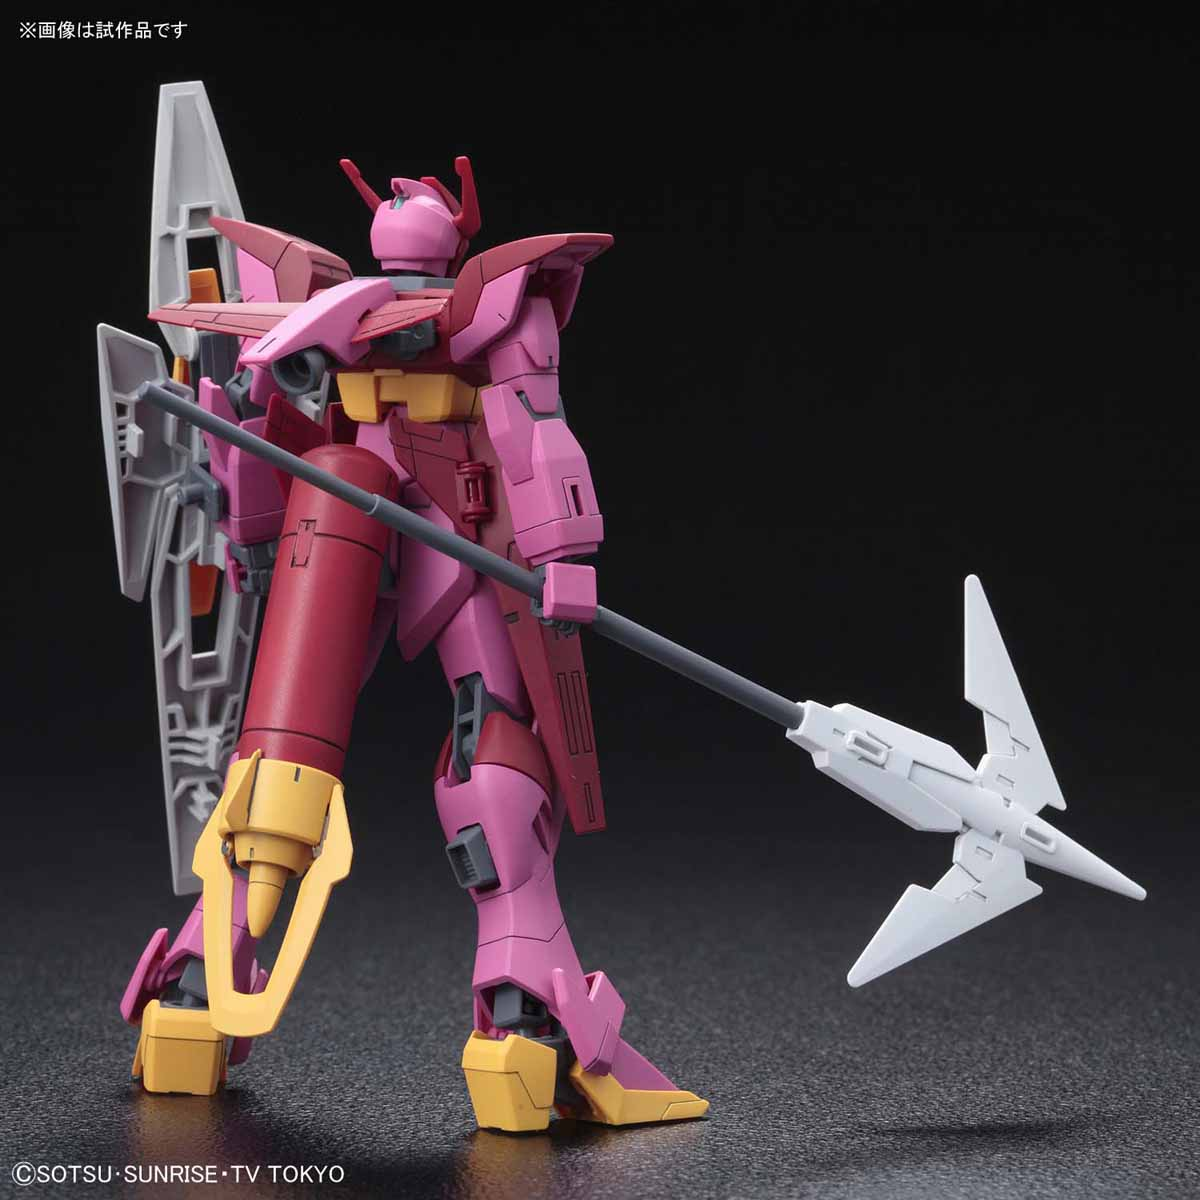 Bandai HGBD Impulse Gundam Ransche